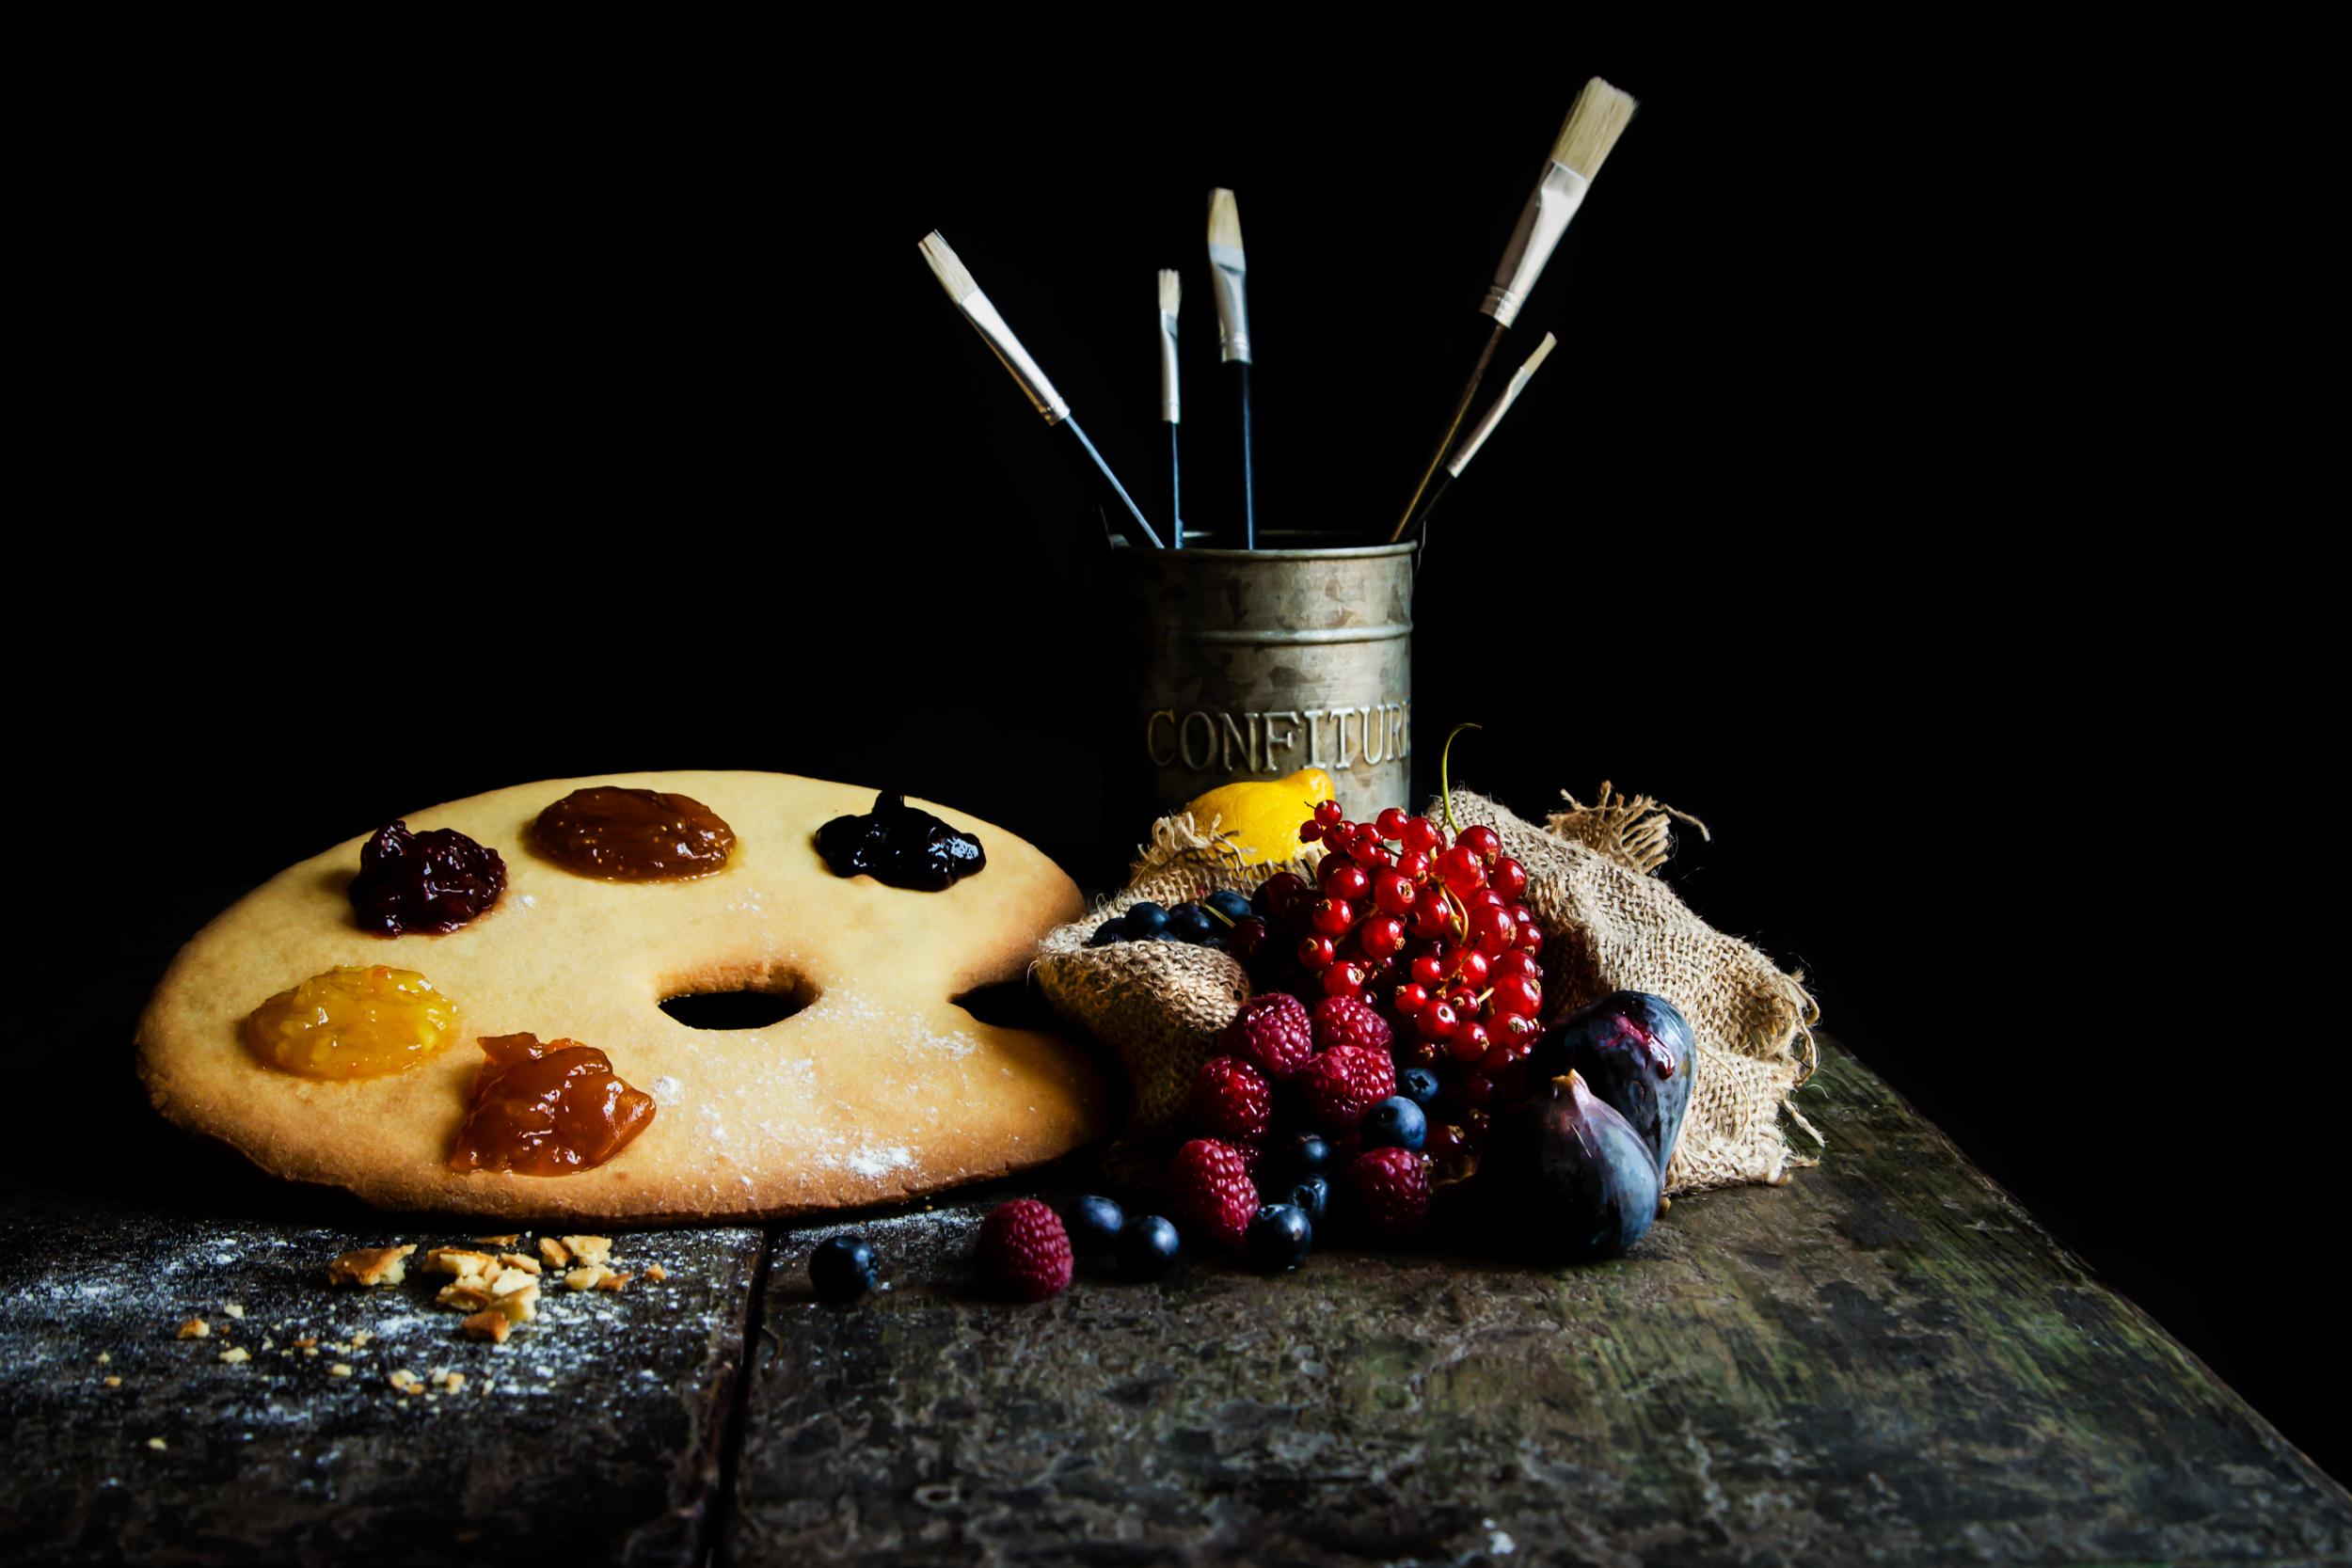 Food painting. Il cibo diventa arte foto di Tatiana Mura